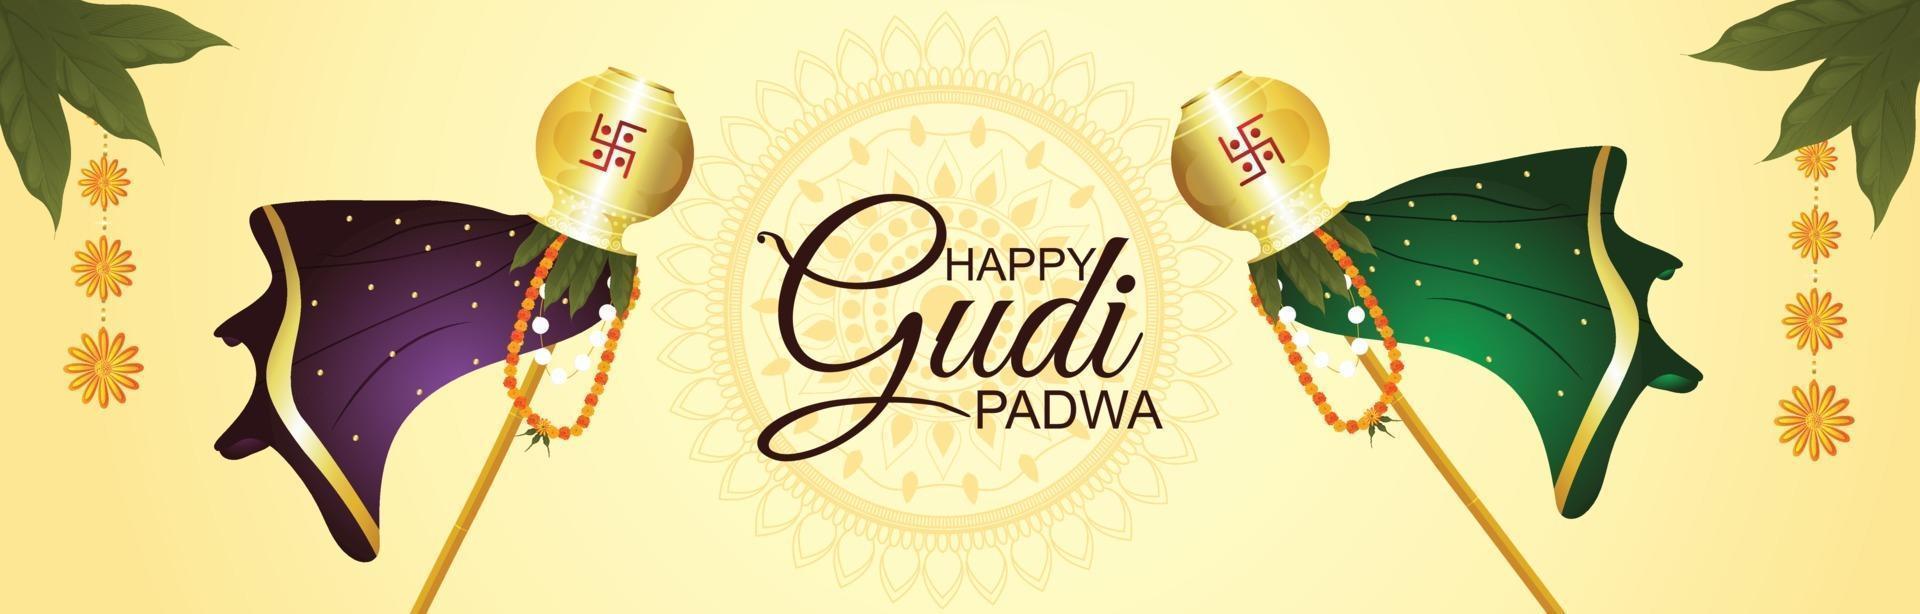 glad ugadi indisk festival gratulationskort vektor